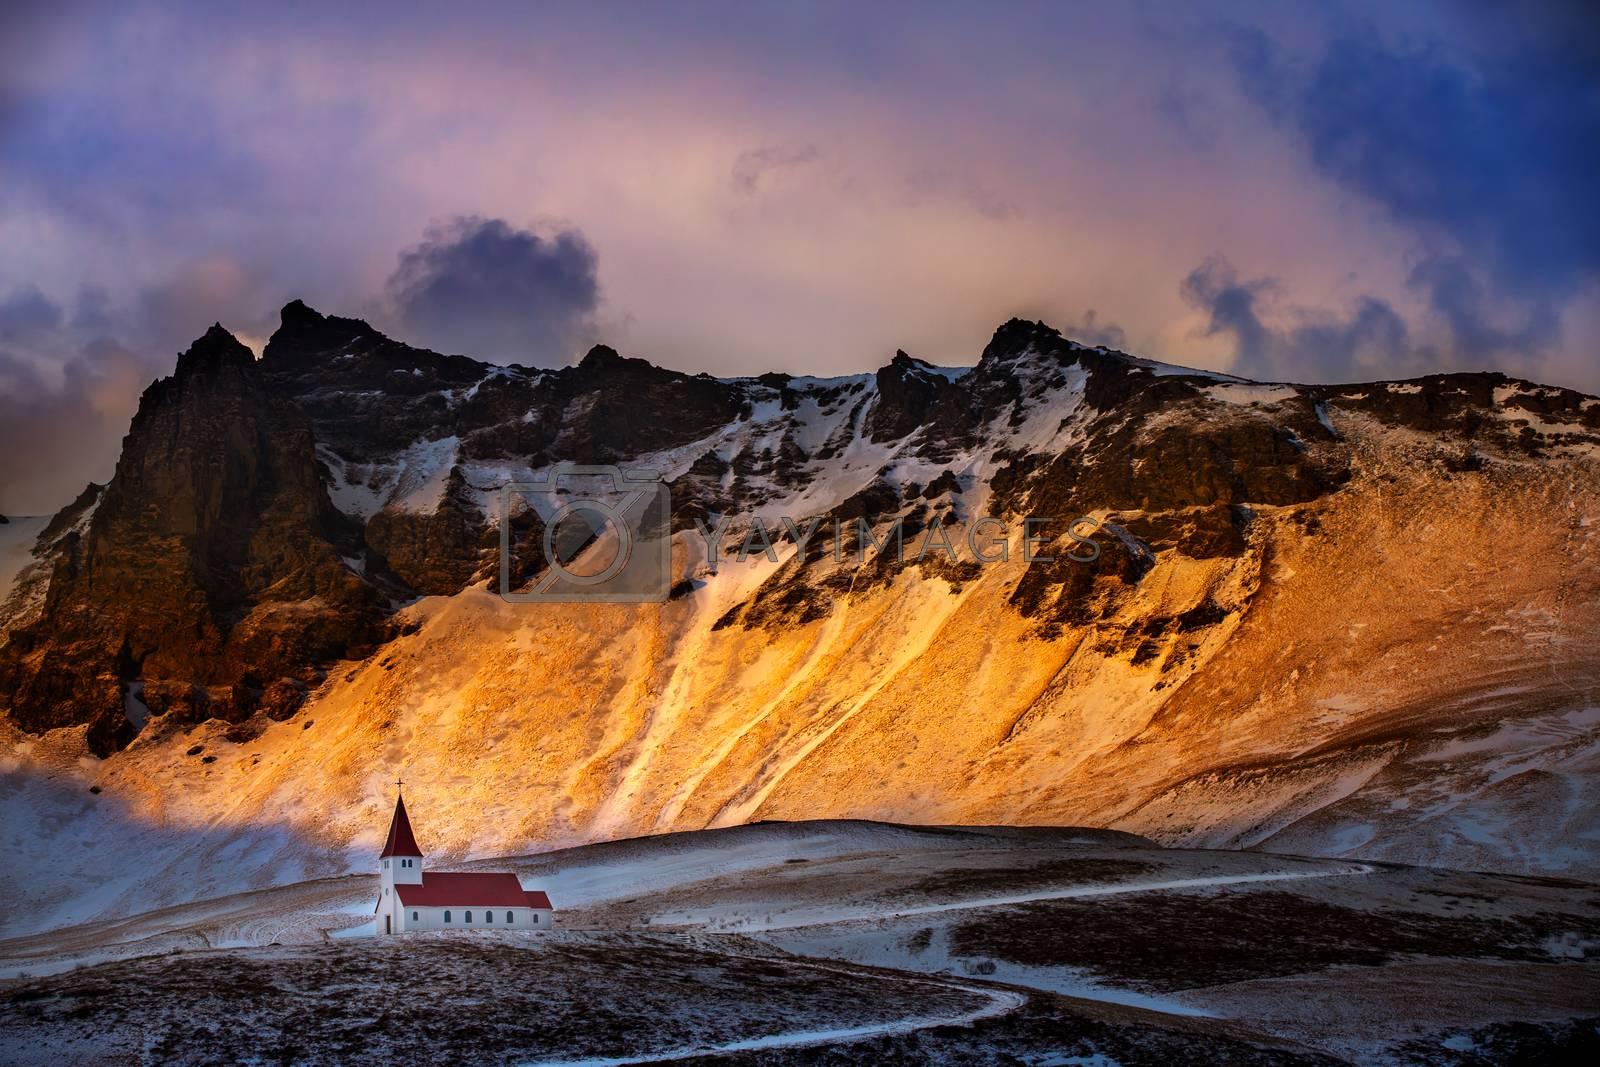 Iceland landscape by Anna_Omelchenko